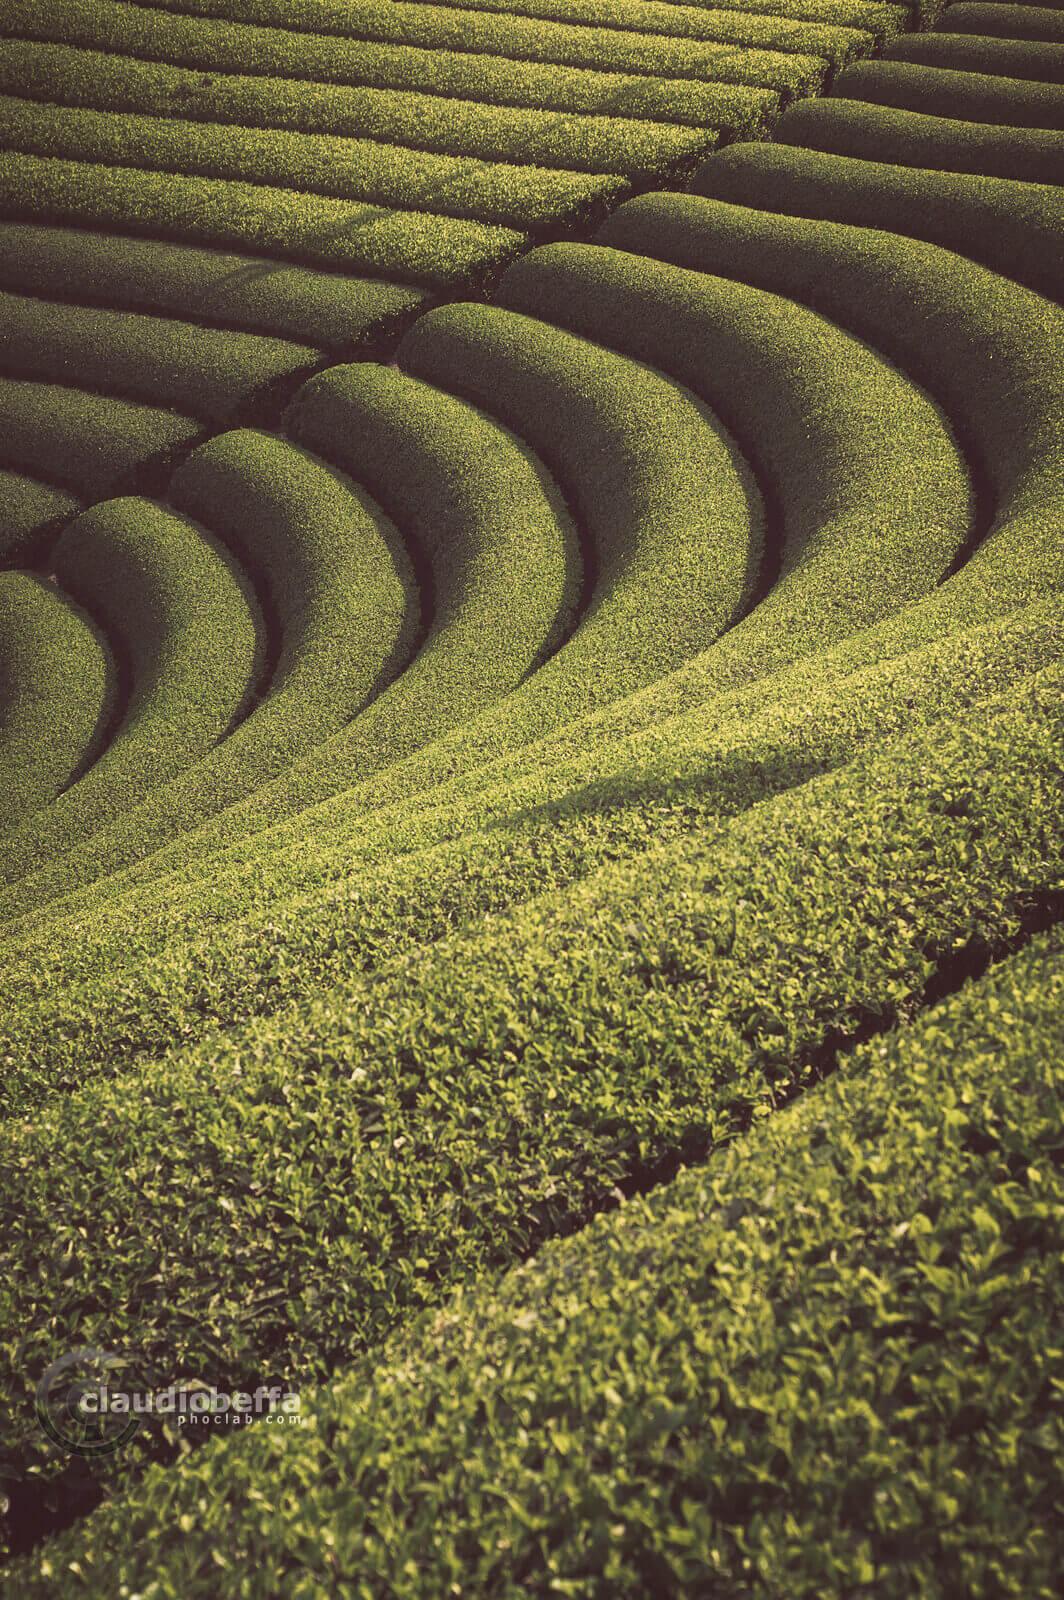 Tea, Plantation, Wazuka, Kyoto, Japan, Countryside, Tradition, Travel, Landscape, Tea culture in Japan, Enkei, Tea field